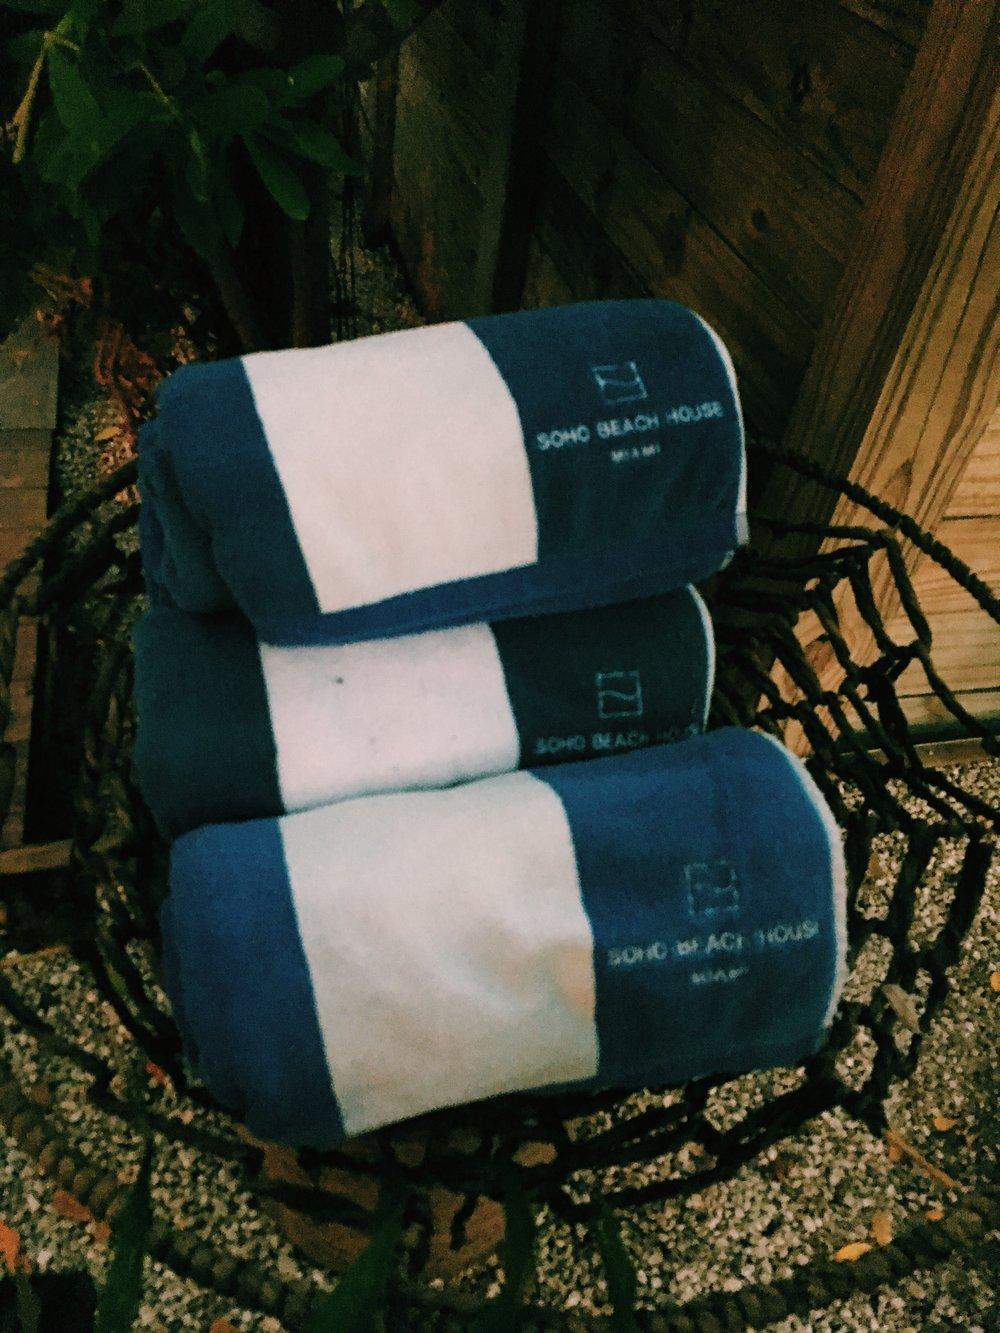 towels soho beach house miami.jpg